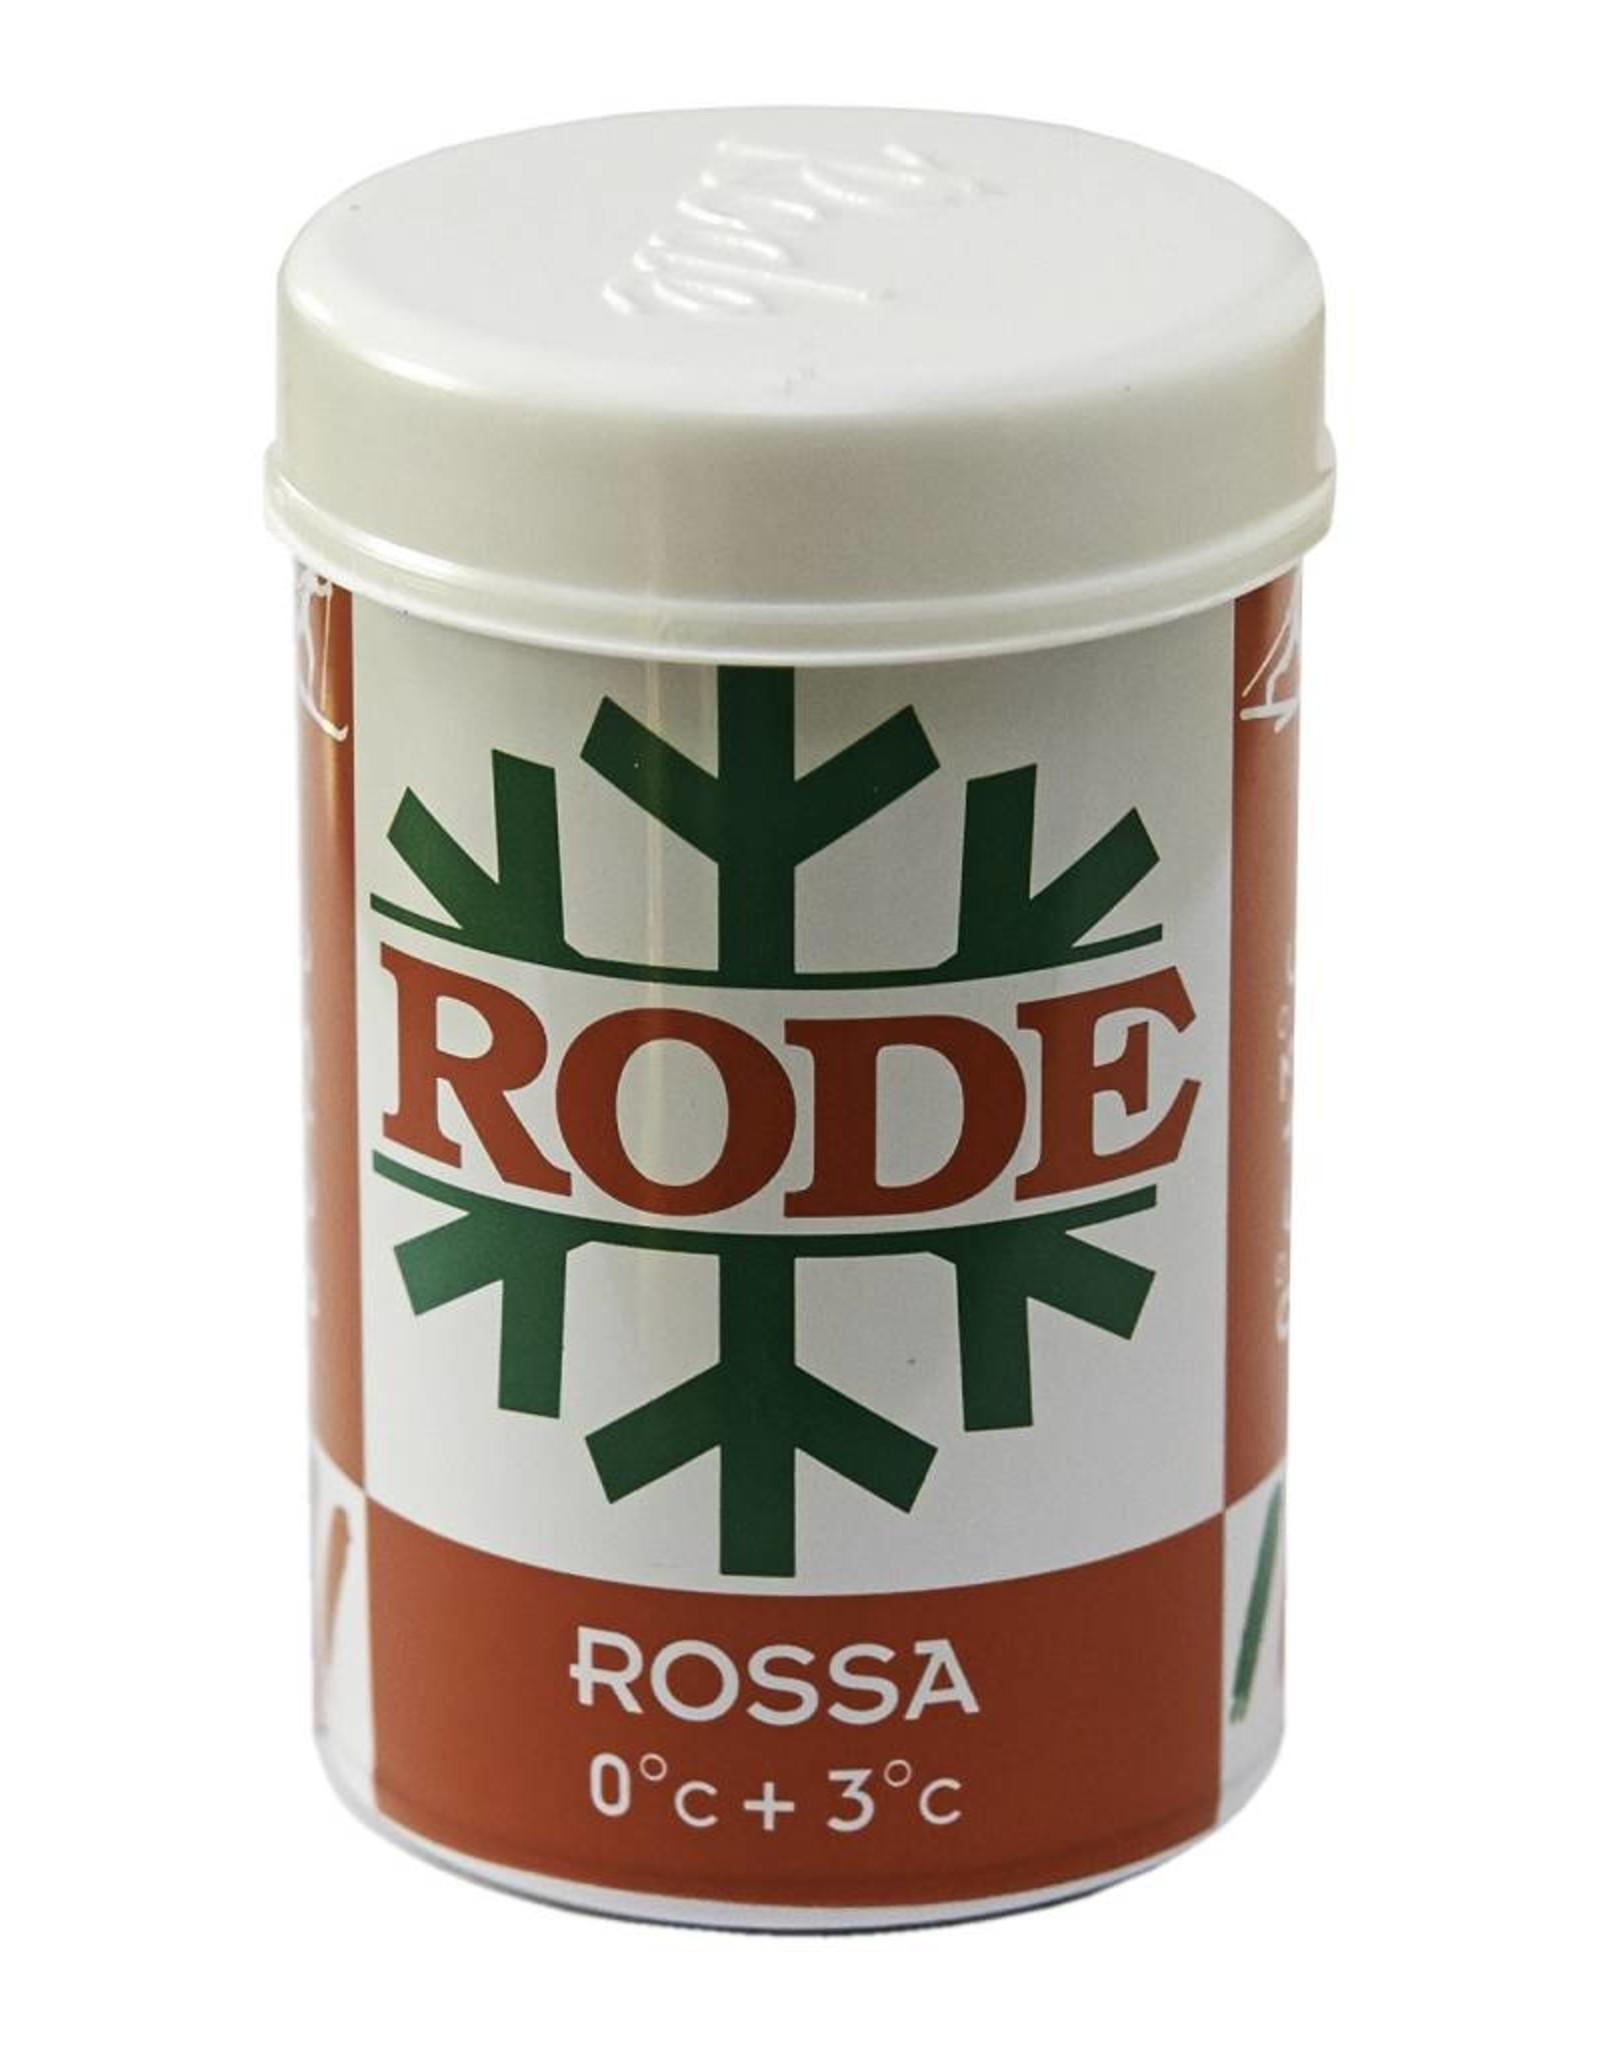 Rode Rossa Kick Wax